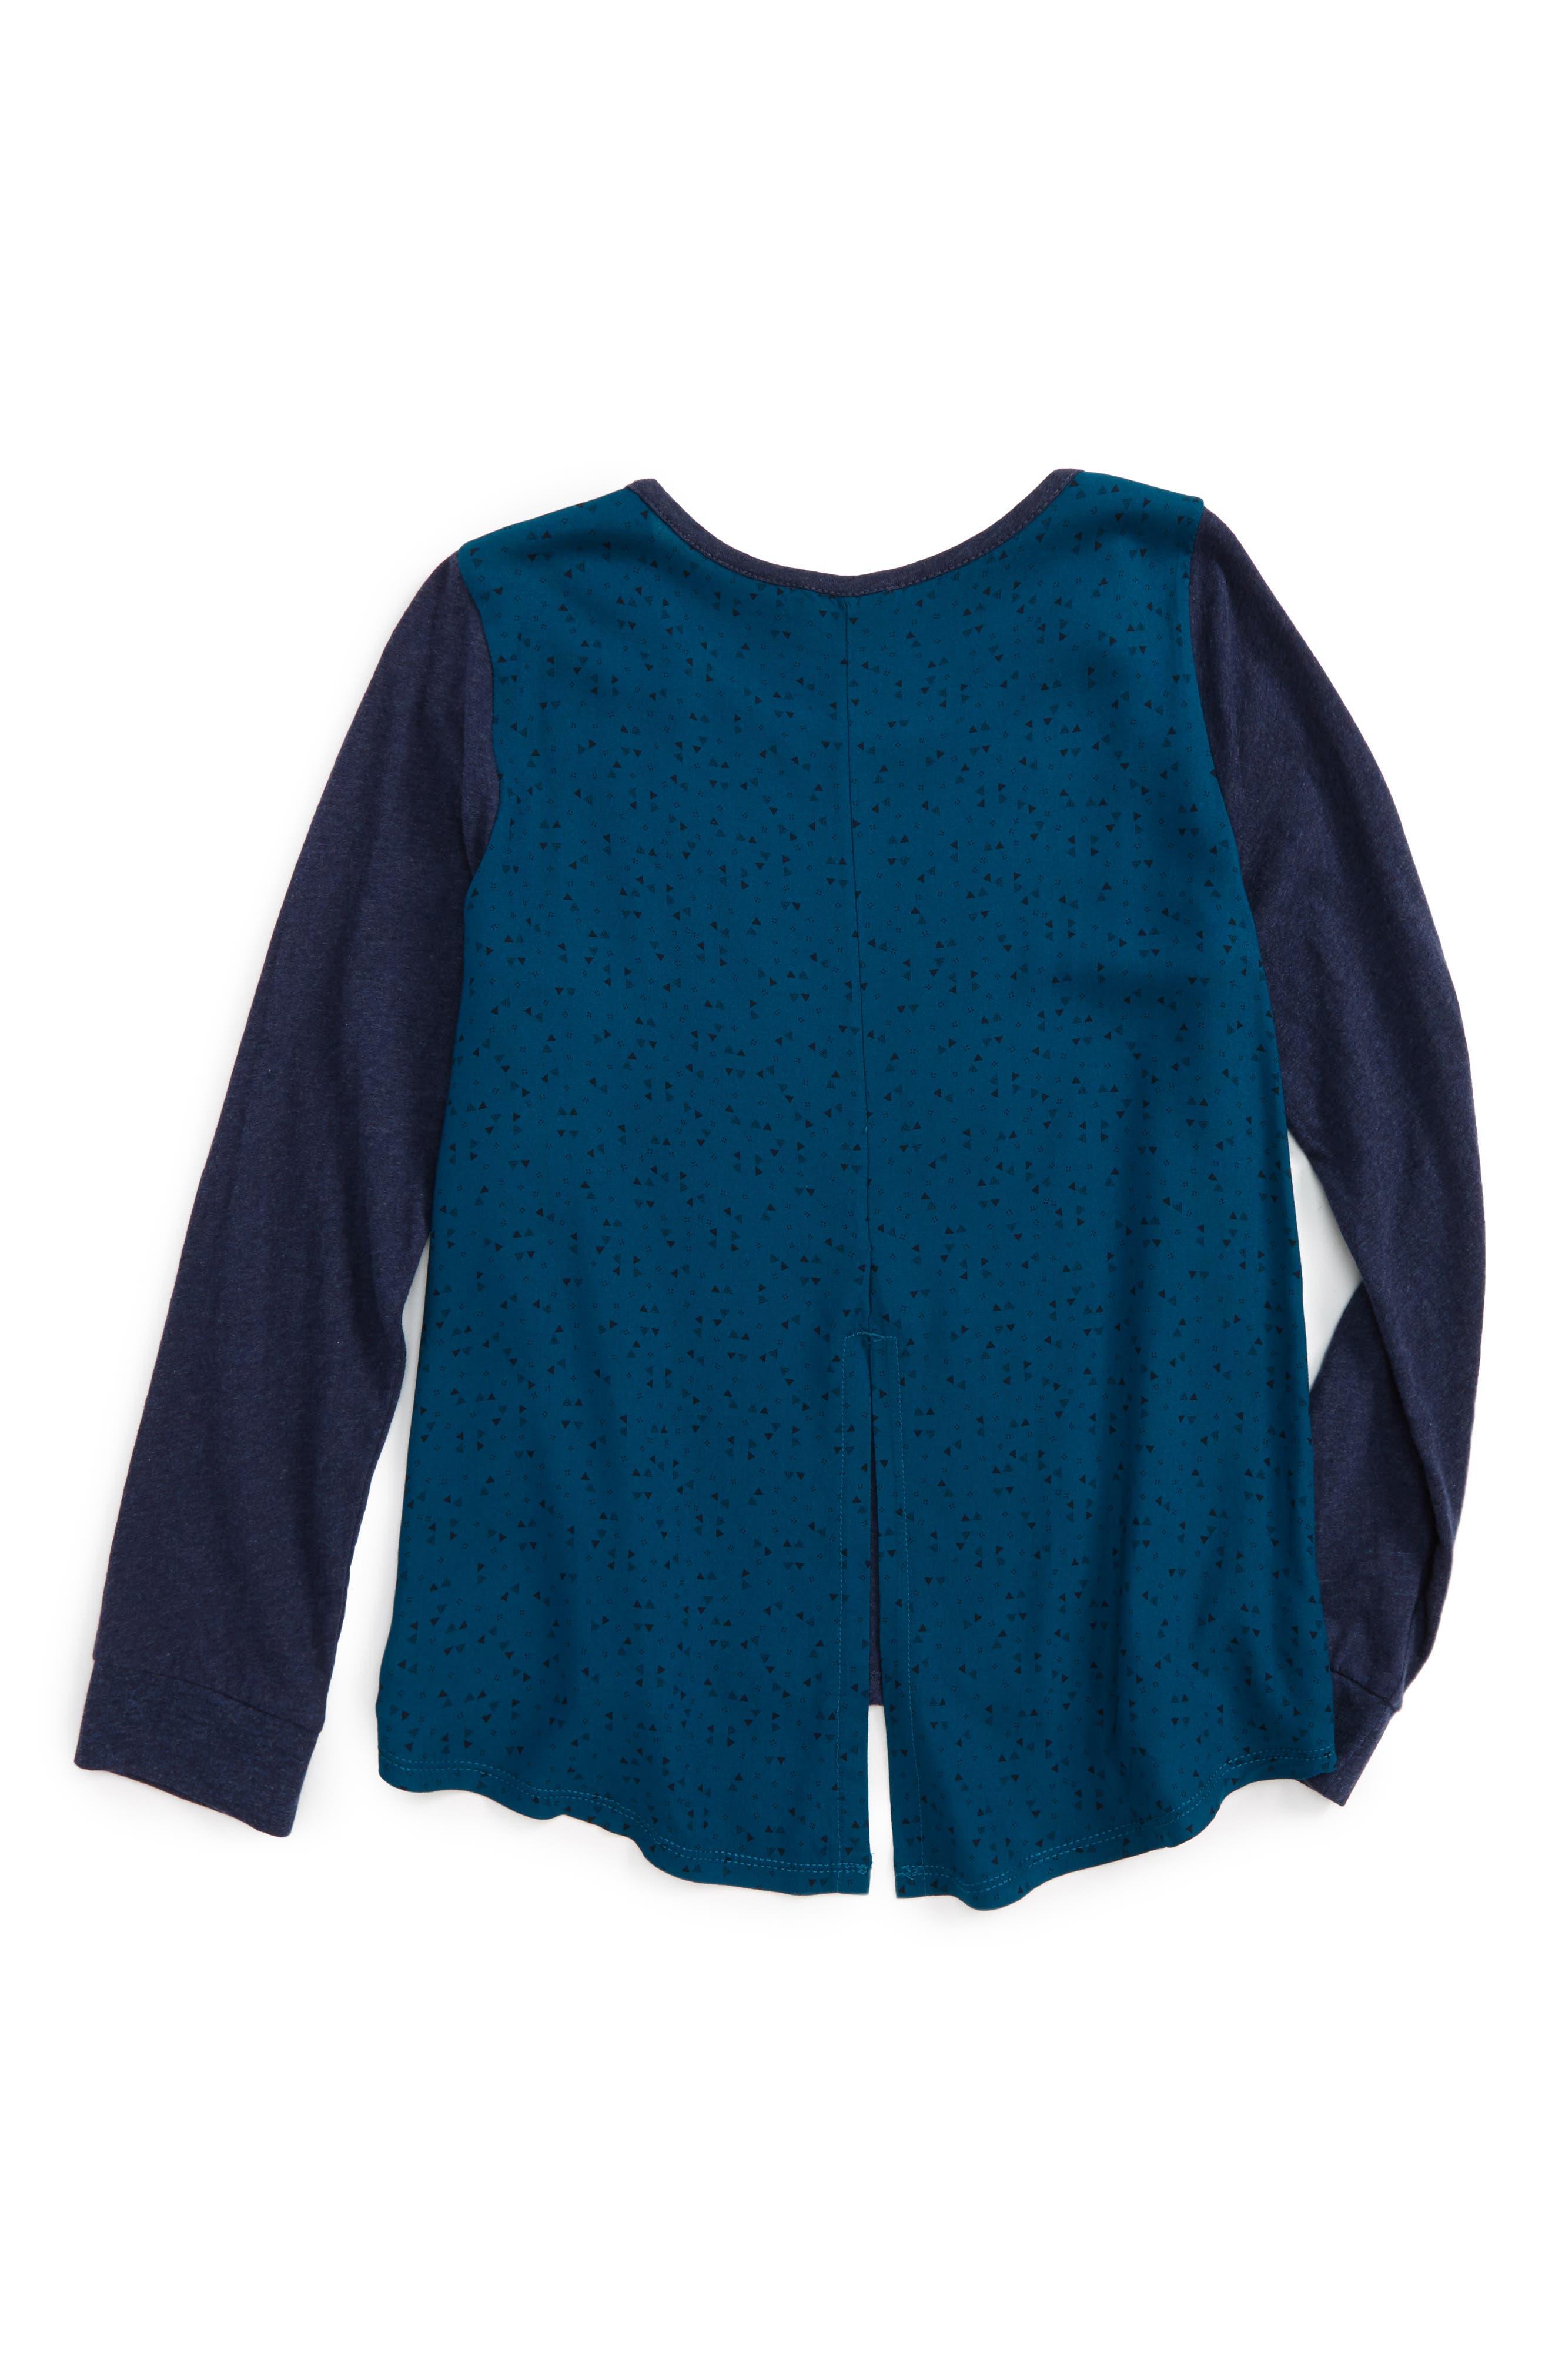 Woven Split Back Shirt,                             Alternate thumbnail 2, color,                             Navy Peacoat Heather